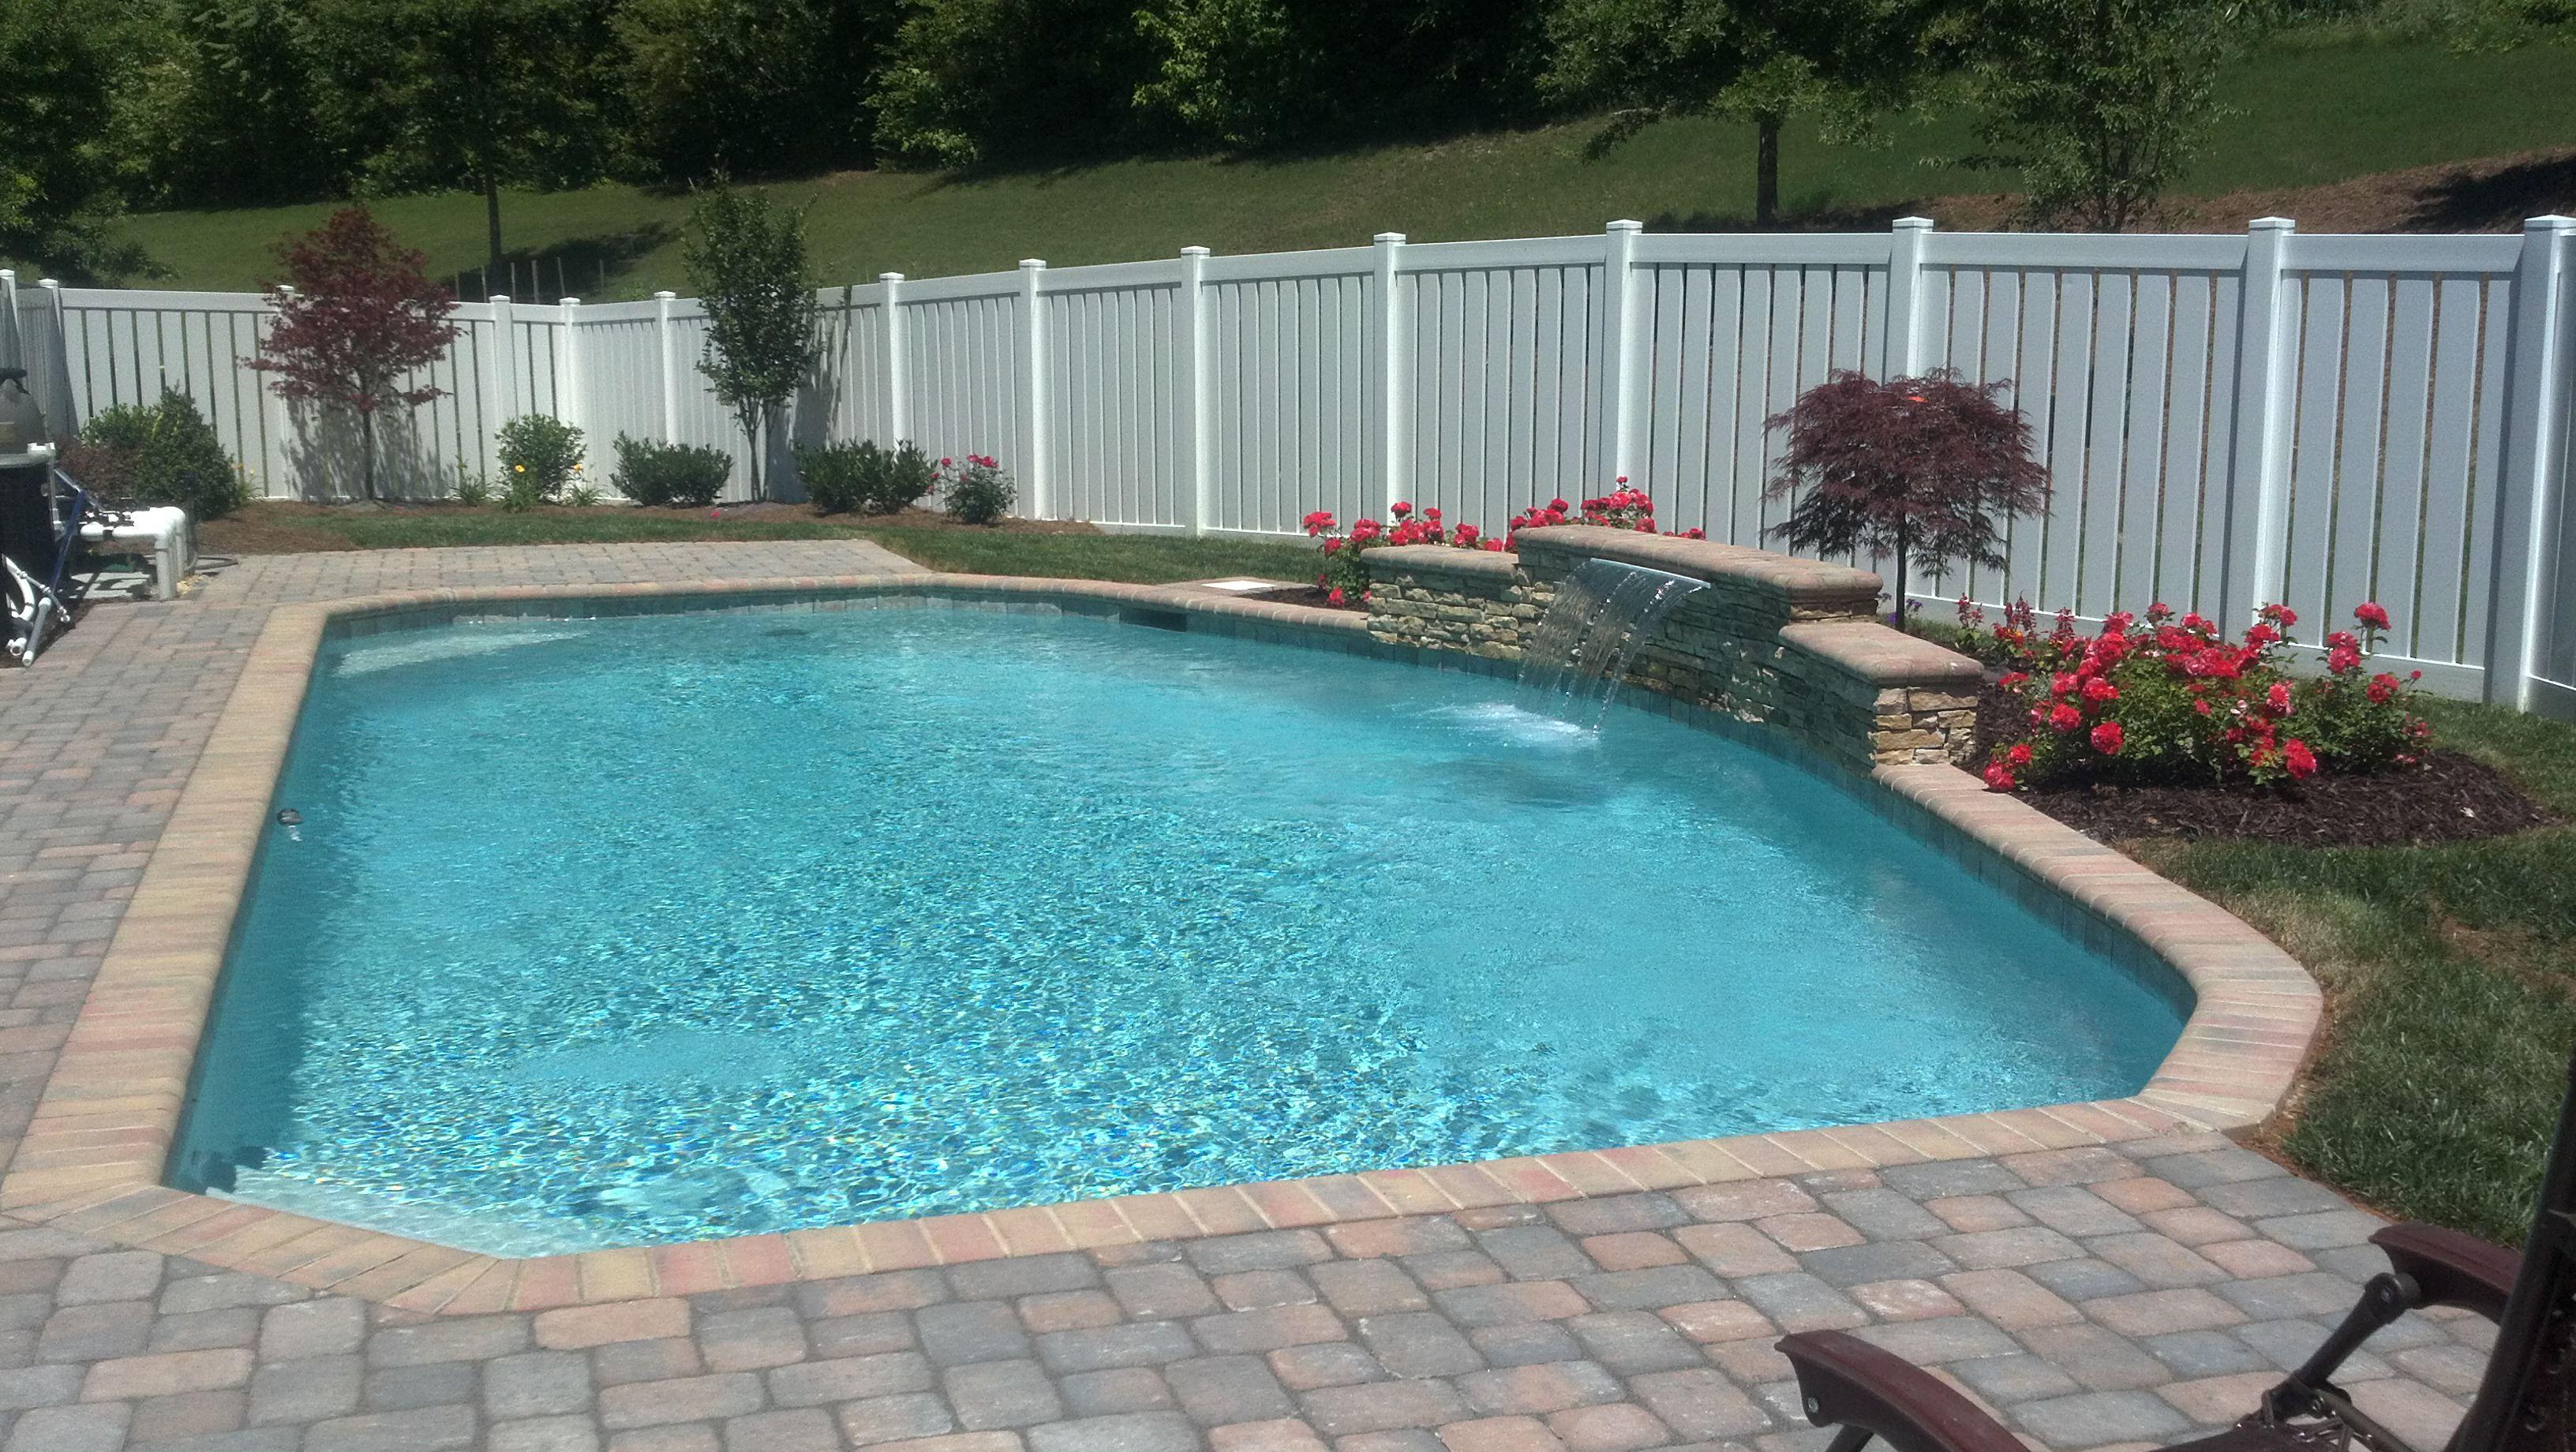 Swimming pool fence options cpc pools custom in ground swimming pools designs - Swimming pool fencing options consider ...